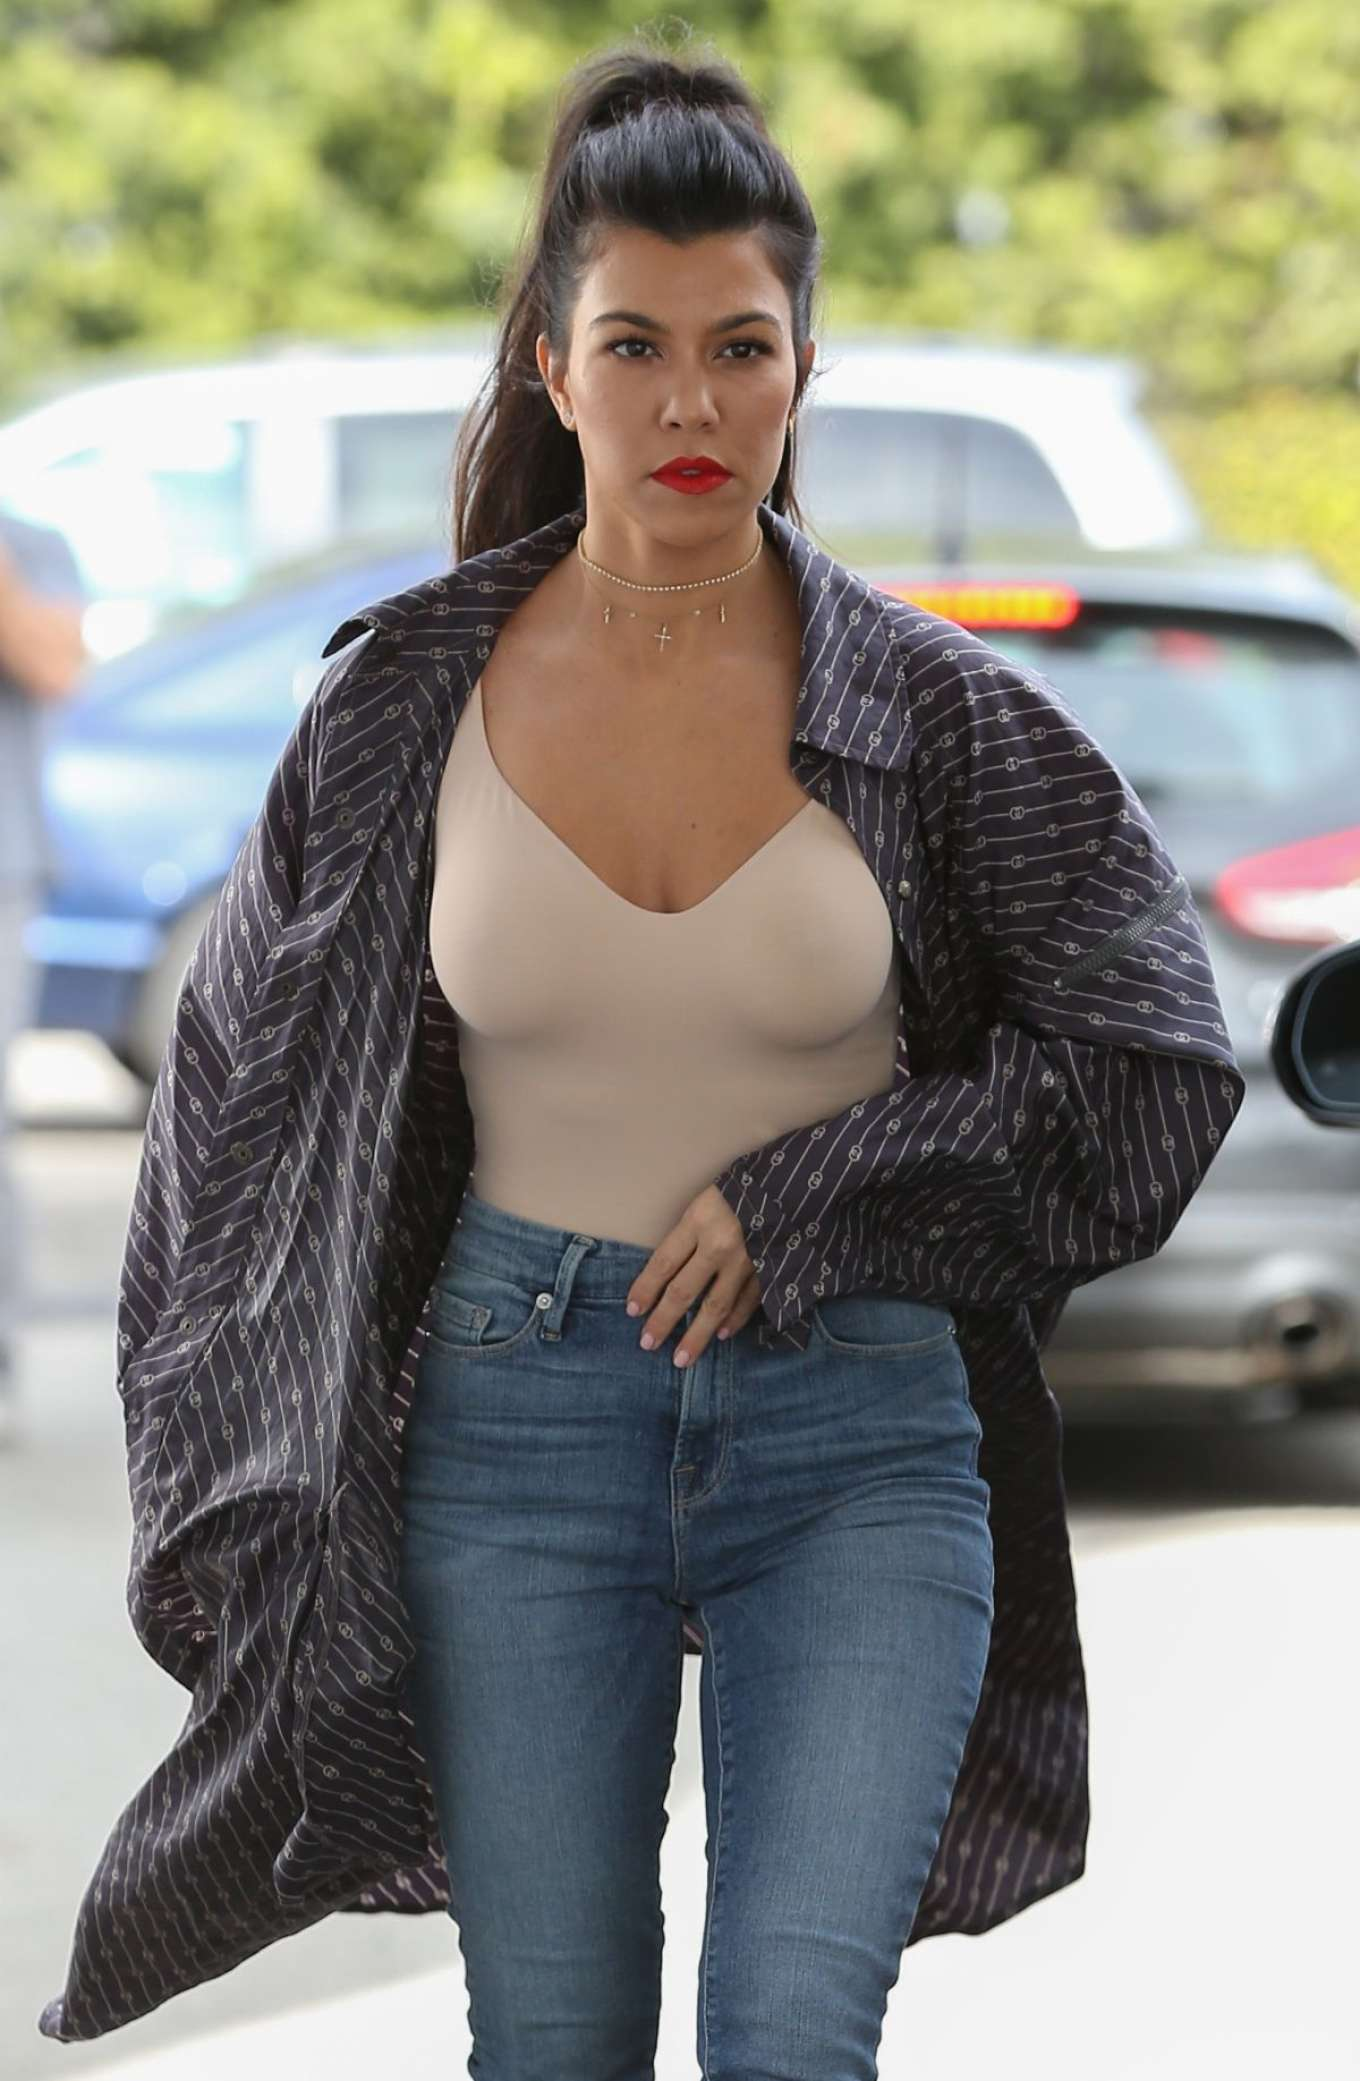 Kourtney Kardashian in Jeans Arrives at Casa Vega in Sherman Oaks